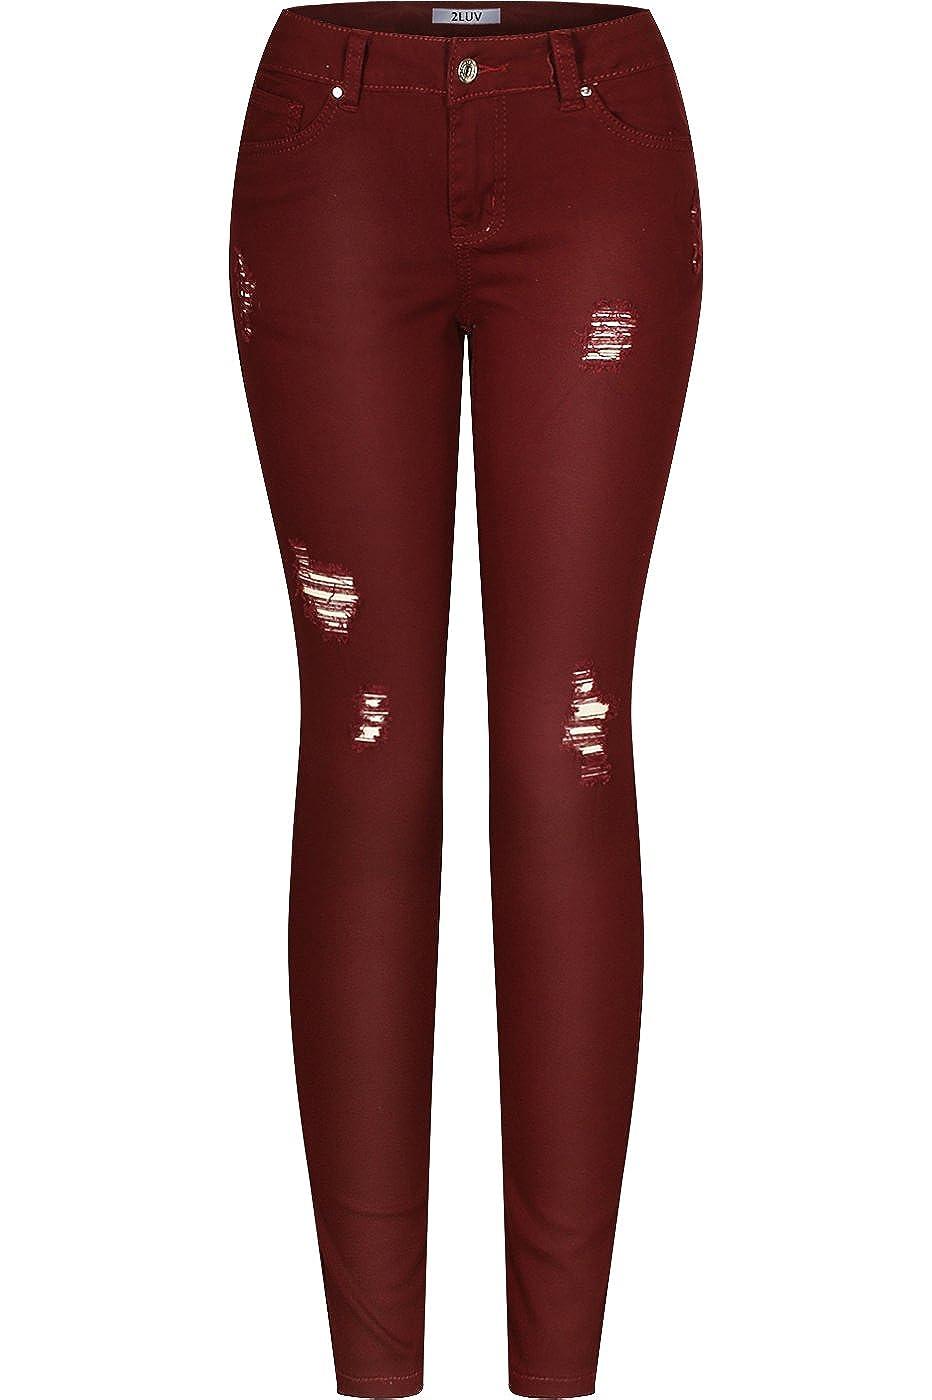 Burgundy 2LUV Women's Stretchy 5 Pocket Destroyed Dark Denim Skinny JeansÂ